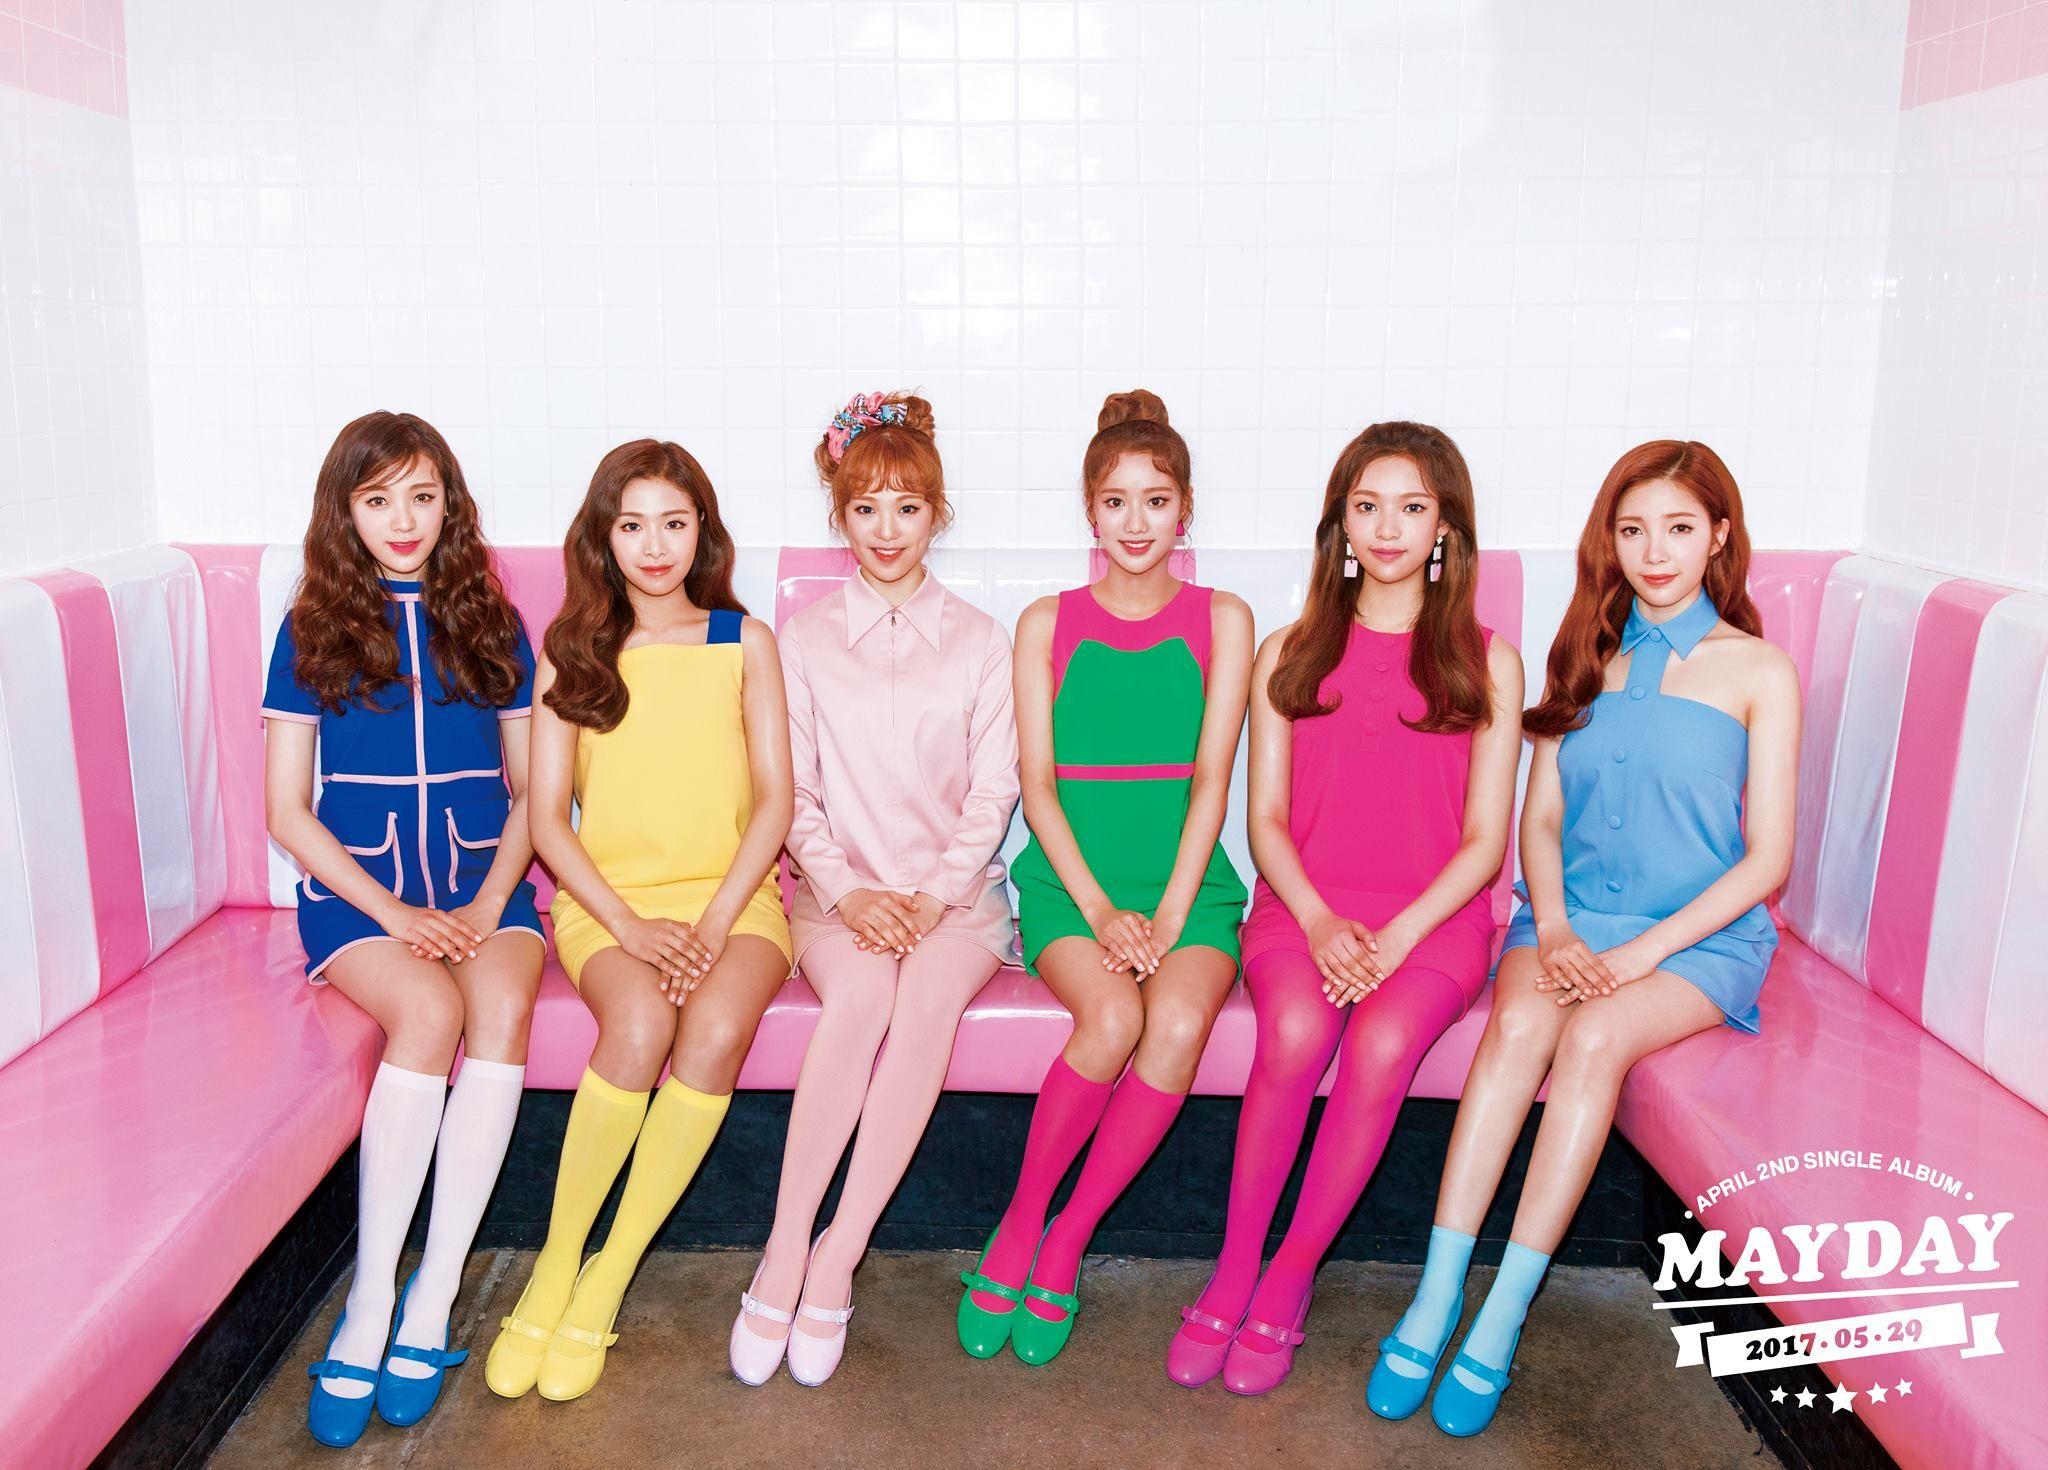 April Mayday April Mayday Comeback April 2017 Comeback April Mayday Teaser Image April Kpop Profile April New Members Kpop K Idols